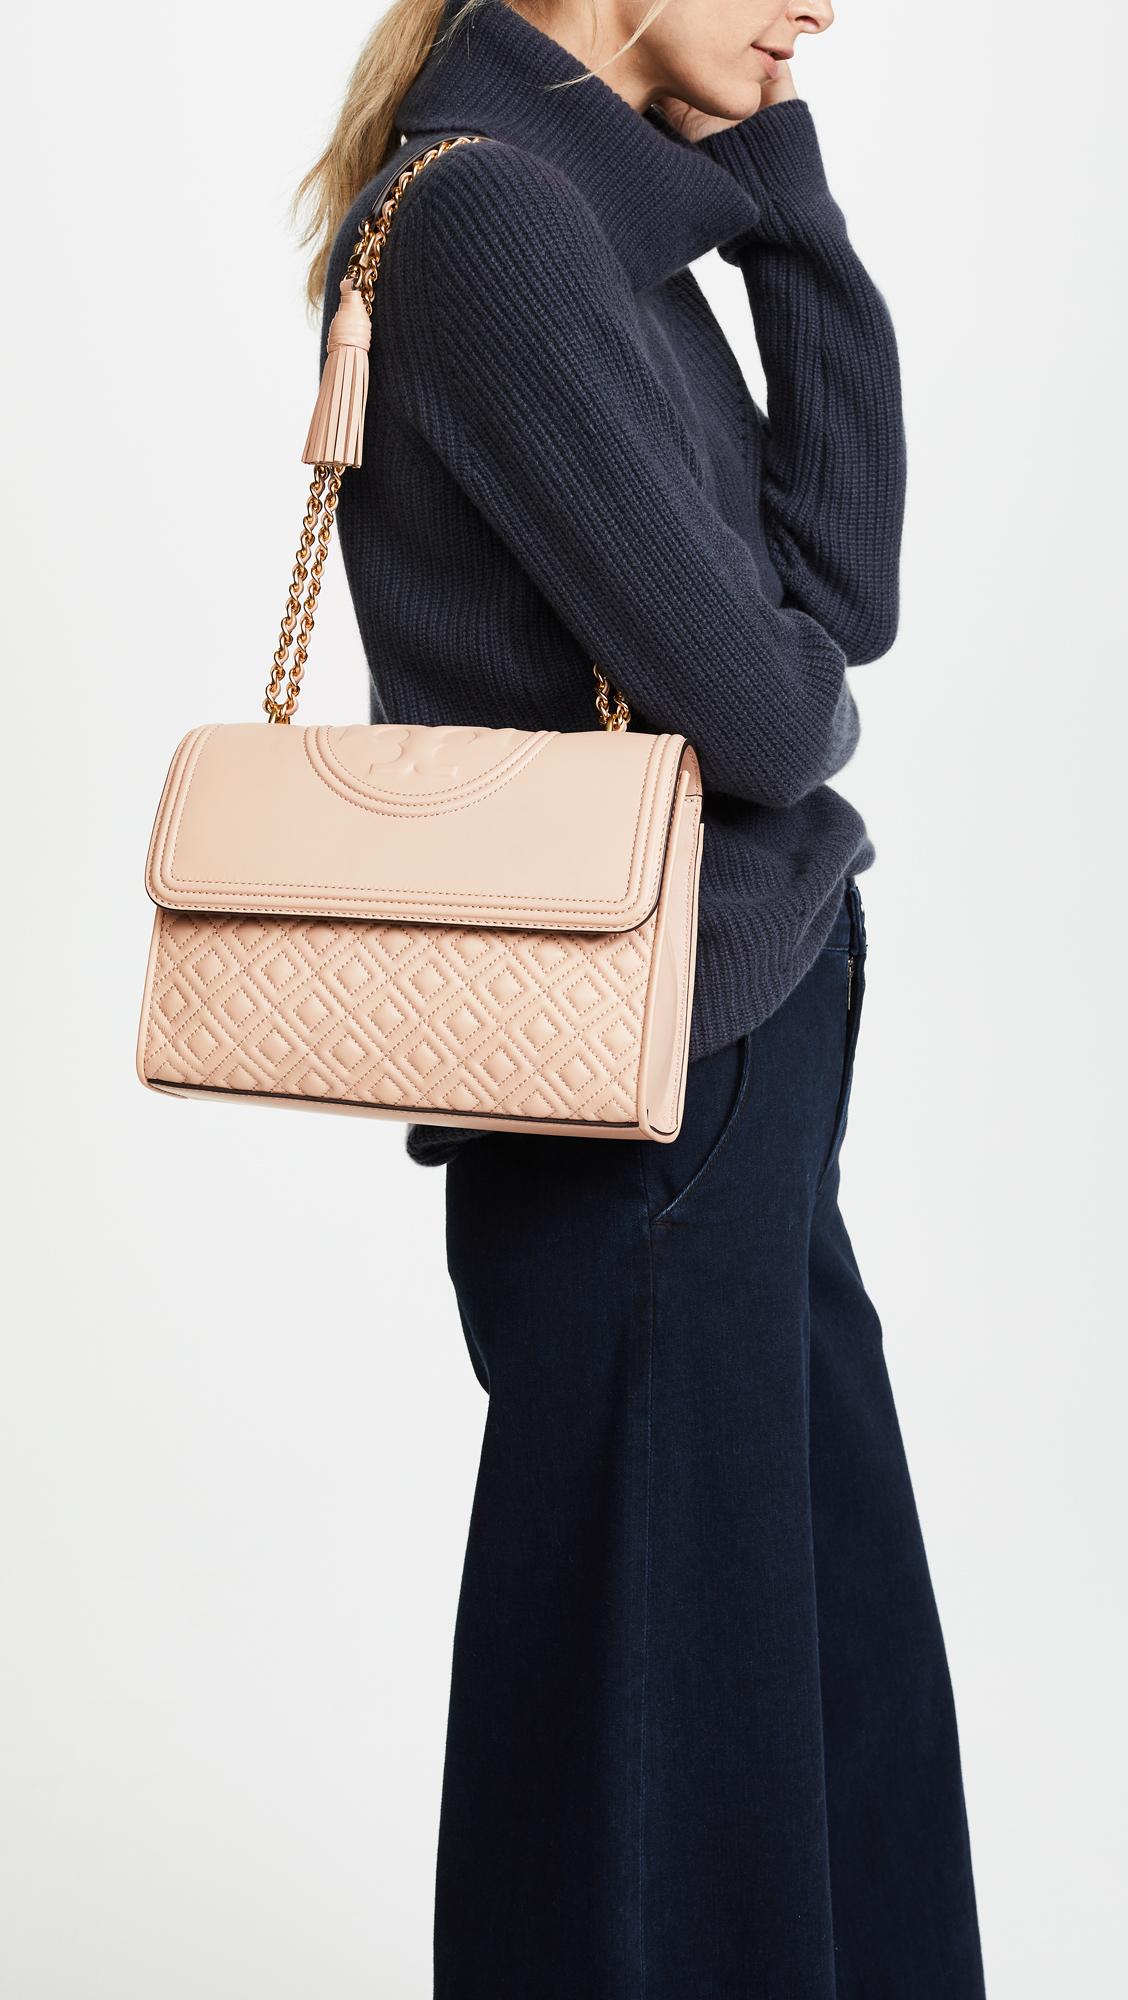 46f036dd3113 Tory Burch Fleming Convertible Shoulder Bag